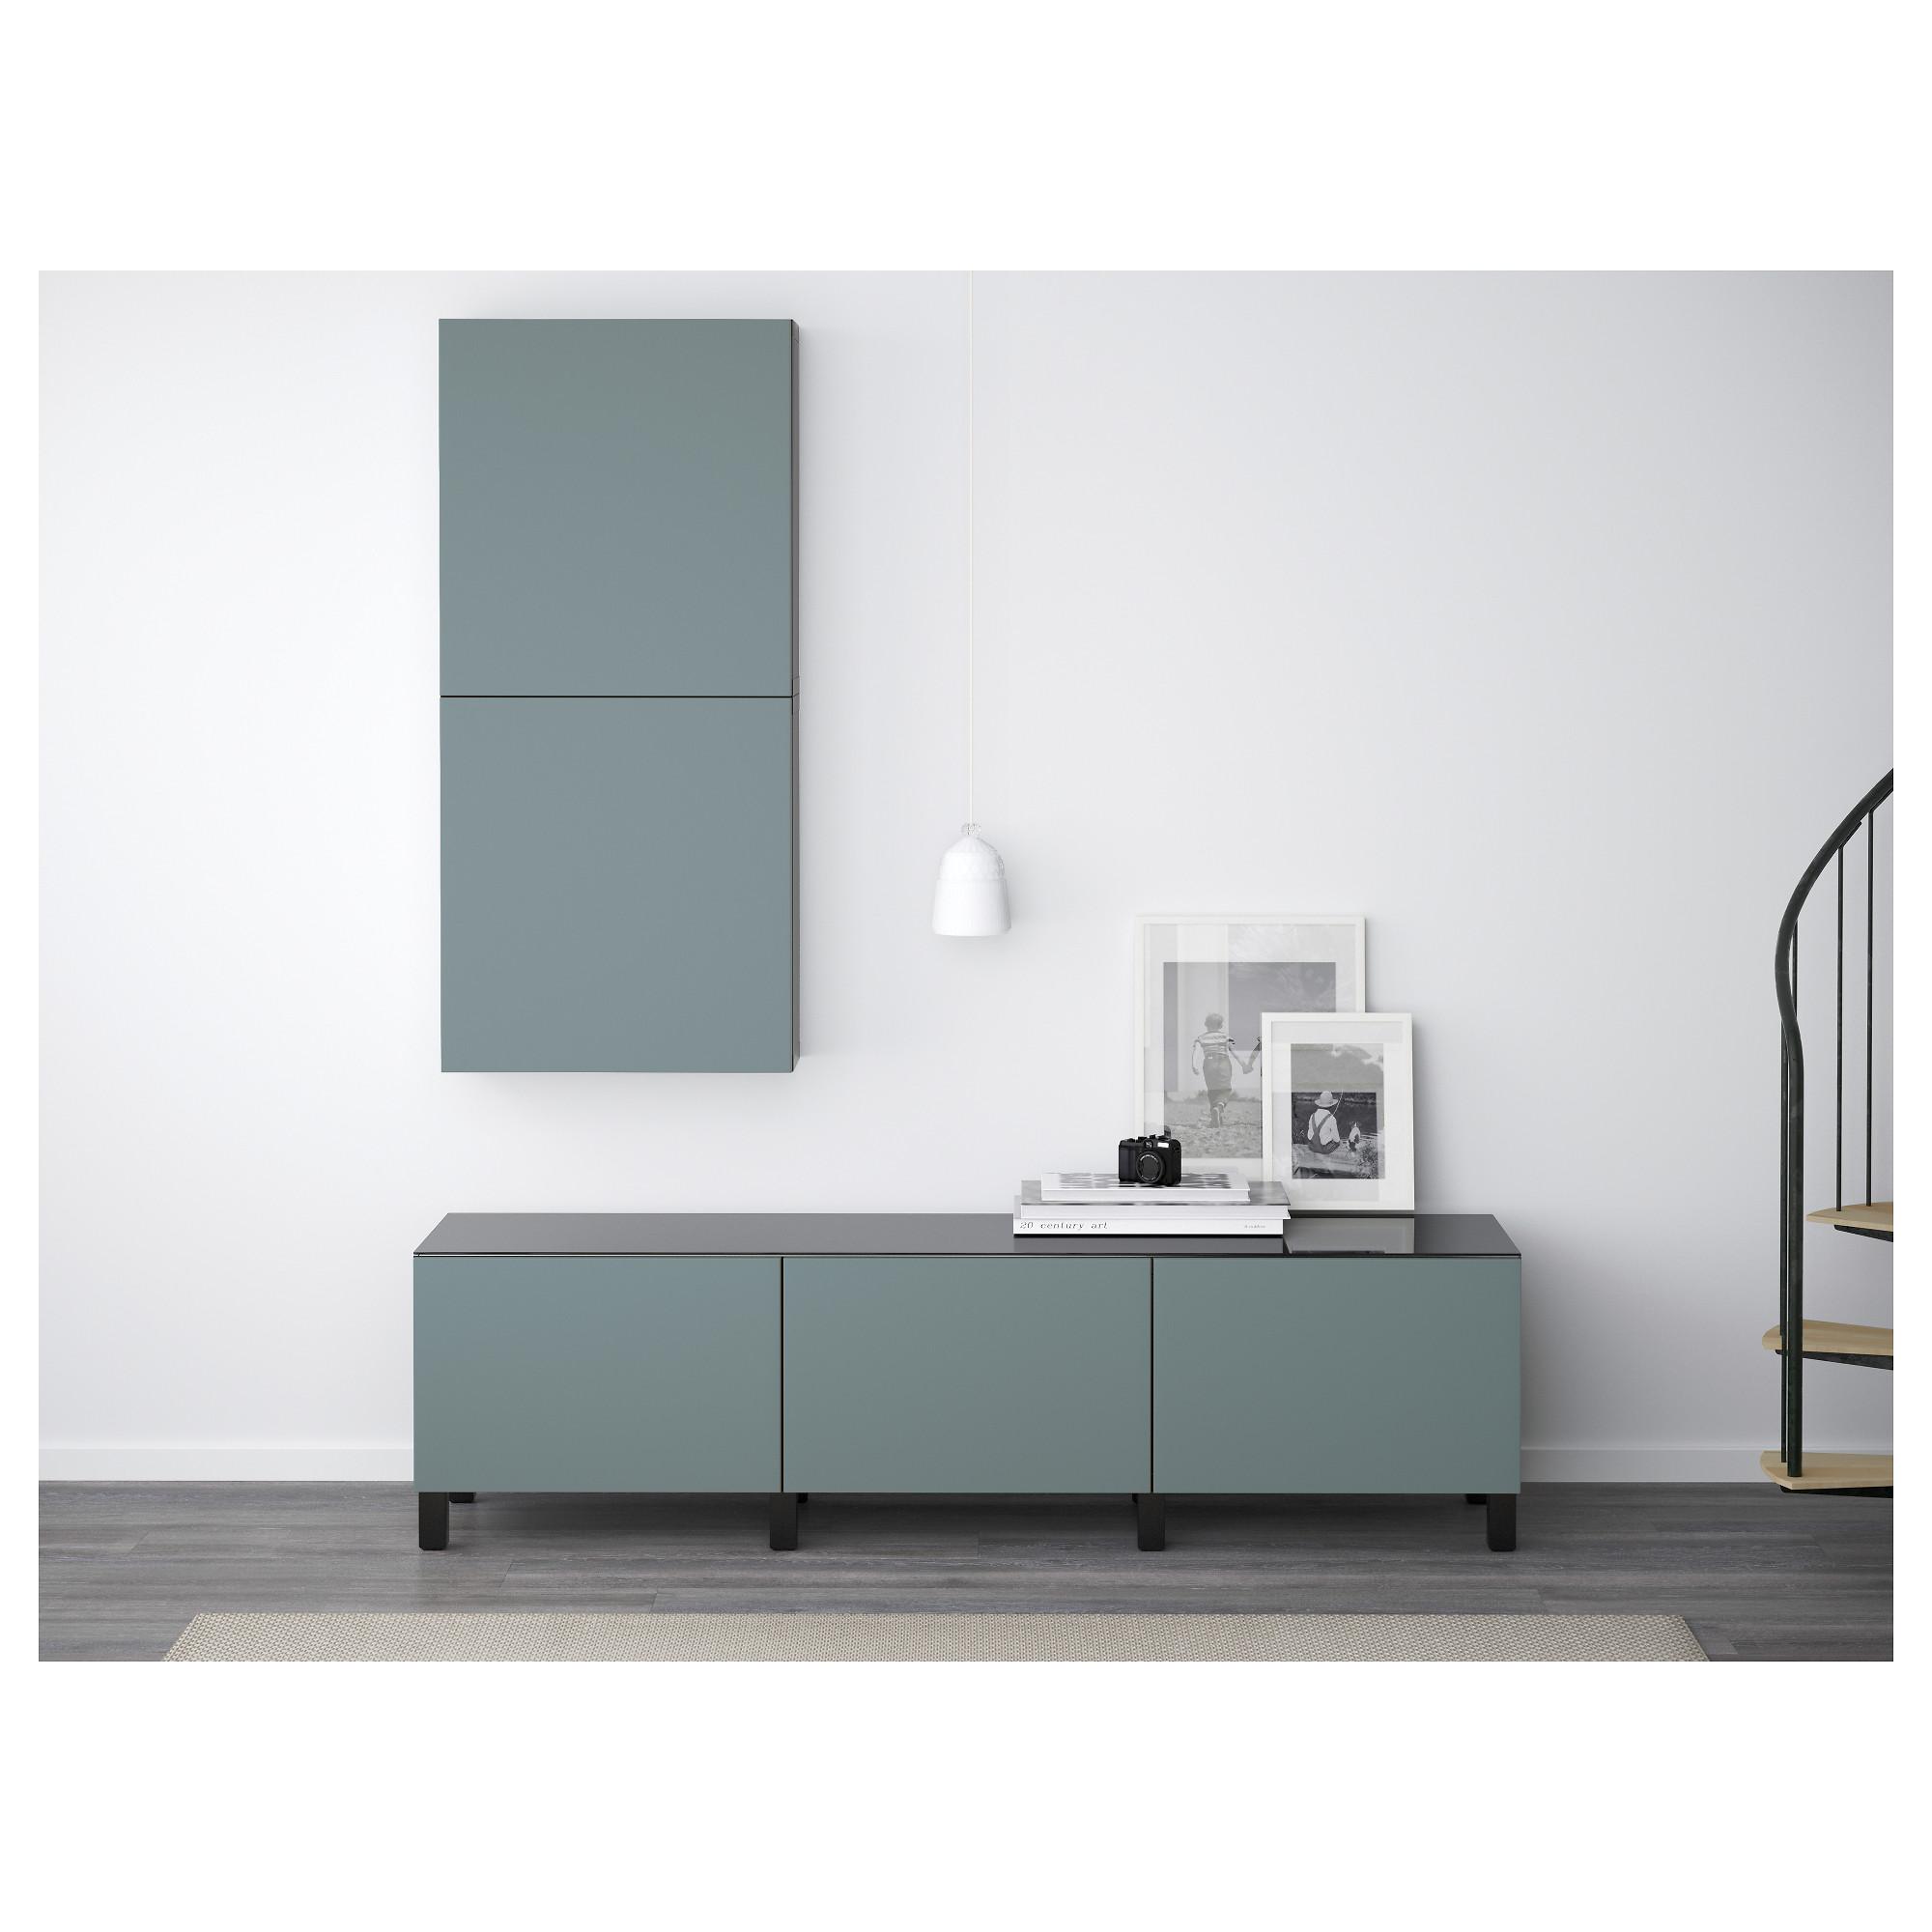 Комбинация для хранения с ящиками БЕСТО артикуль № 292.450.64 в наличии. Онлайн магазин IKEA РБ. Быстрая доставка и установка.